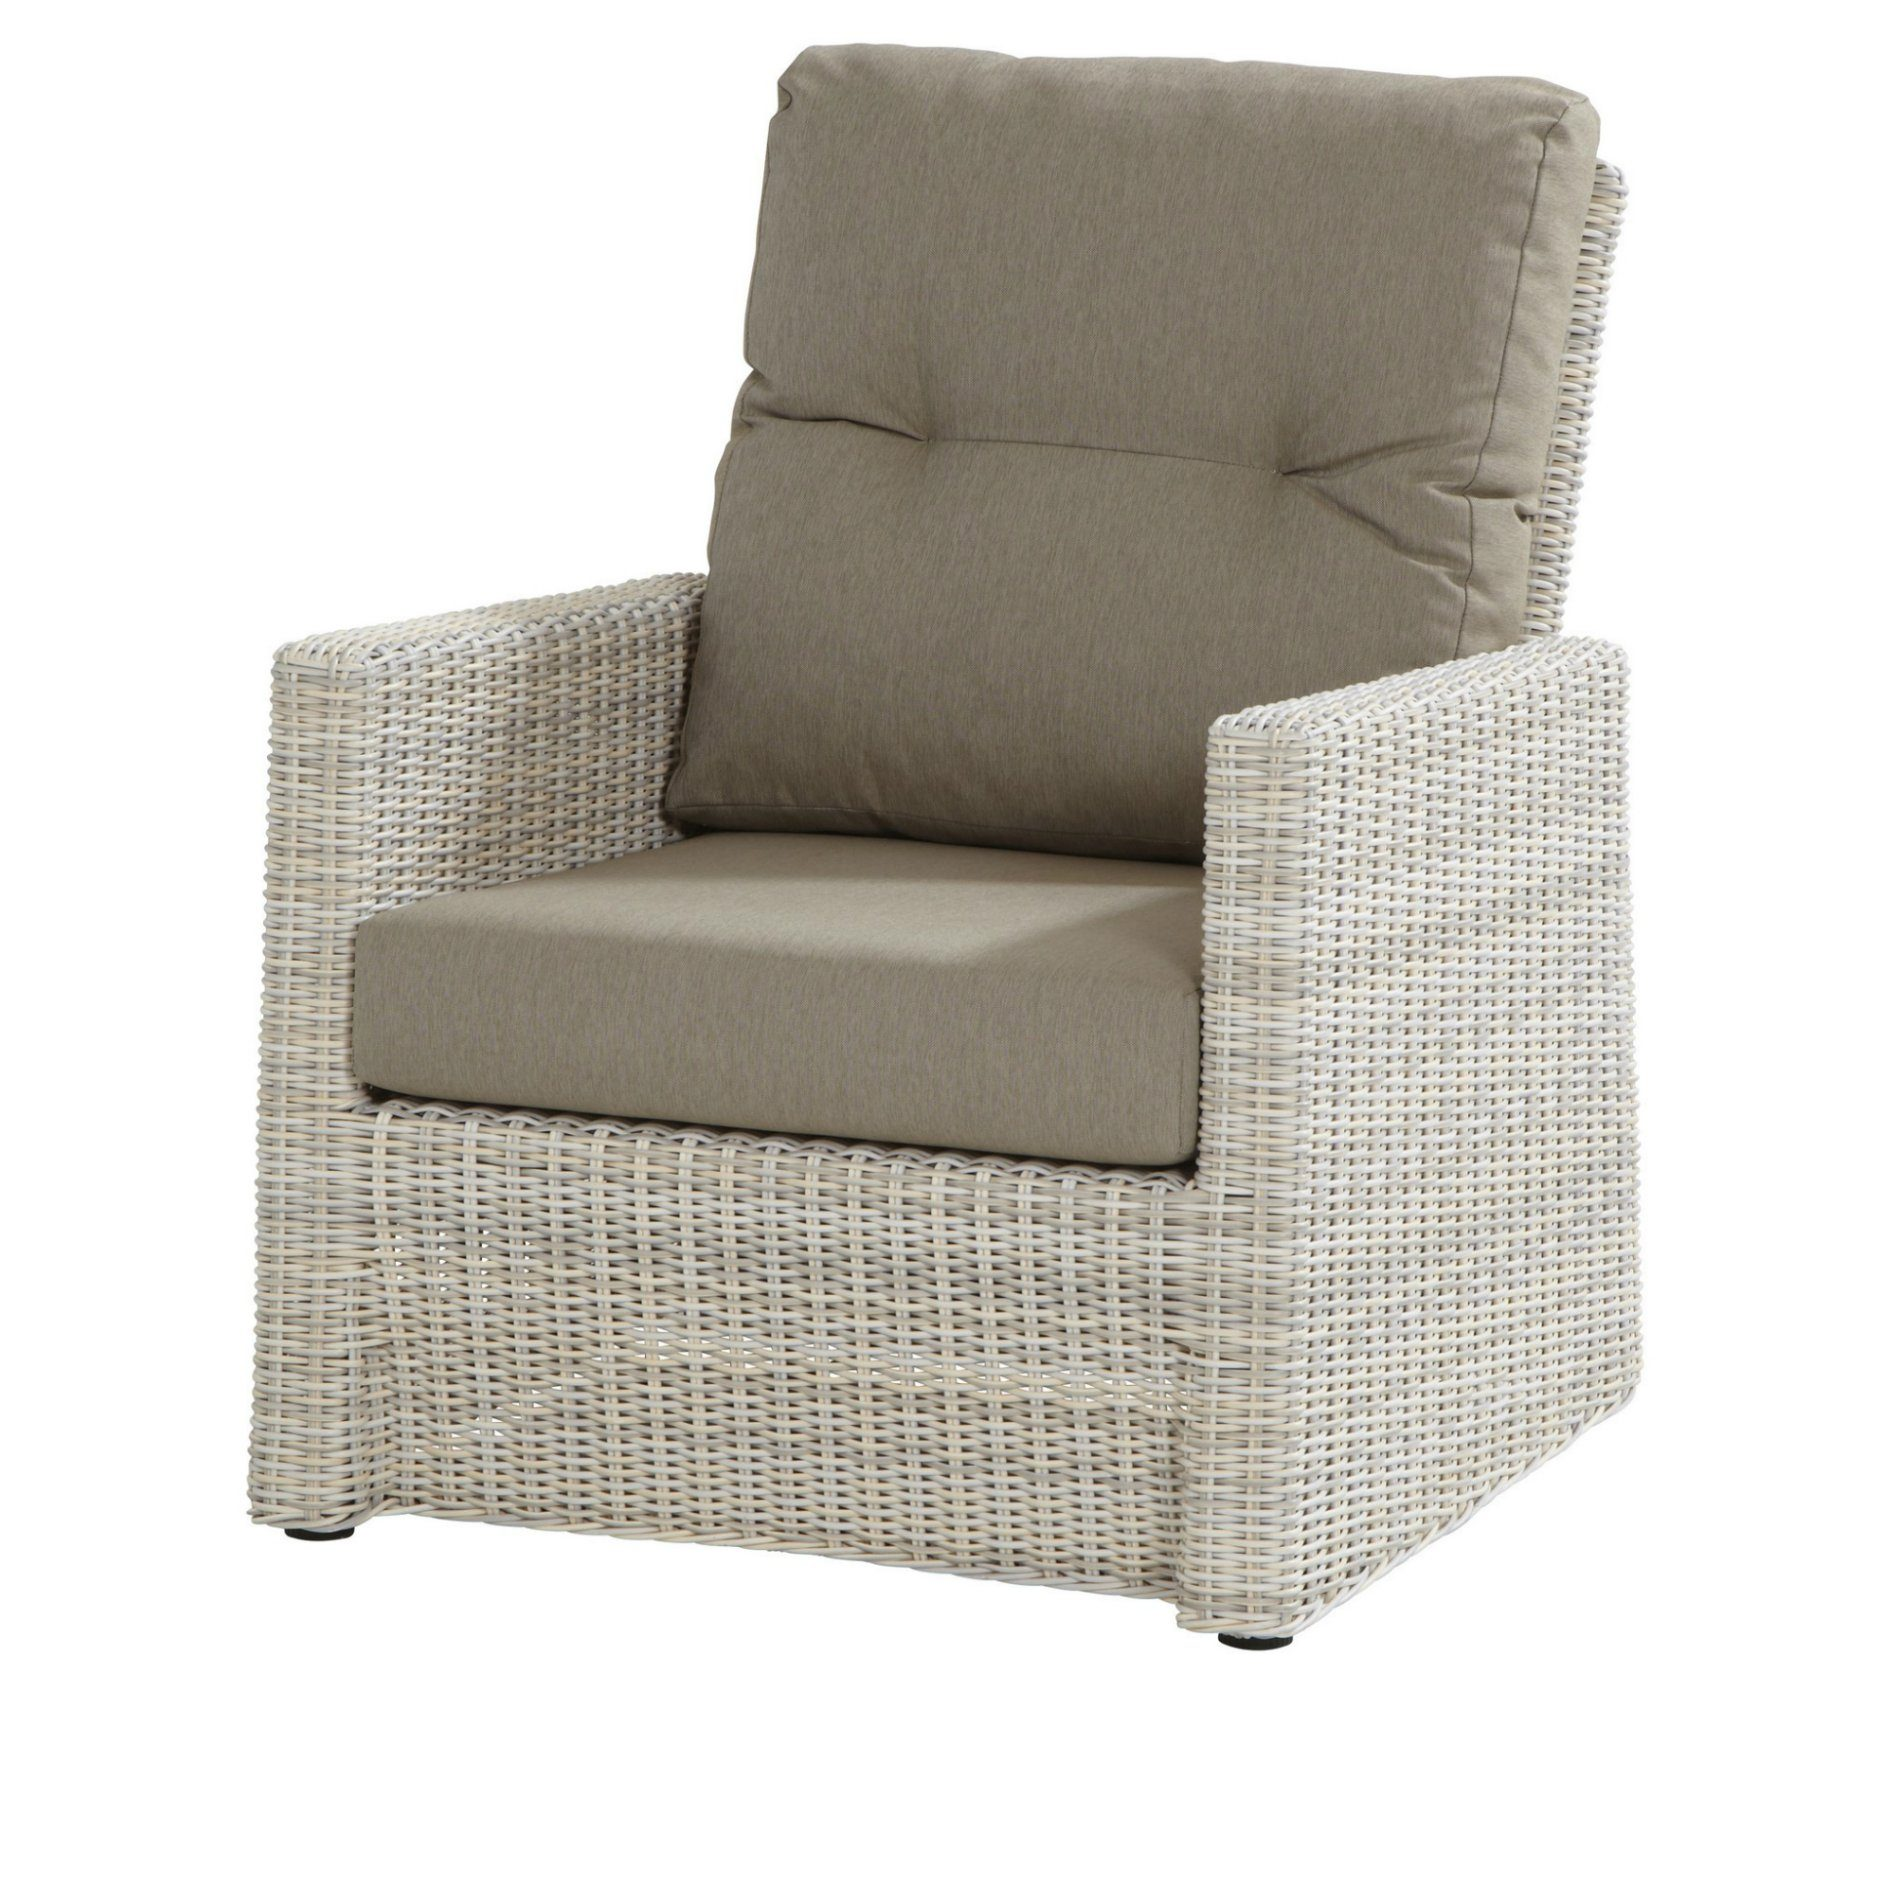 stunning outdoor lounge sessel photos thehammondreport. Black Bedroom Furniture Sets. Home Design Ideas